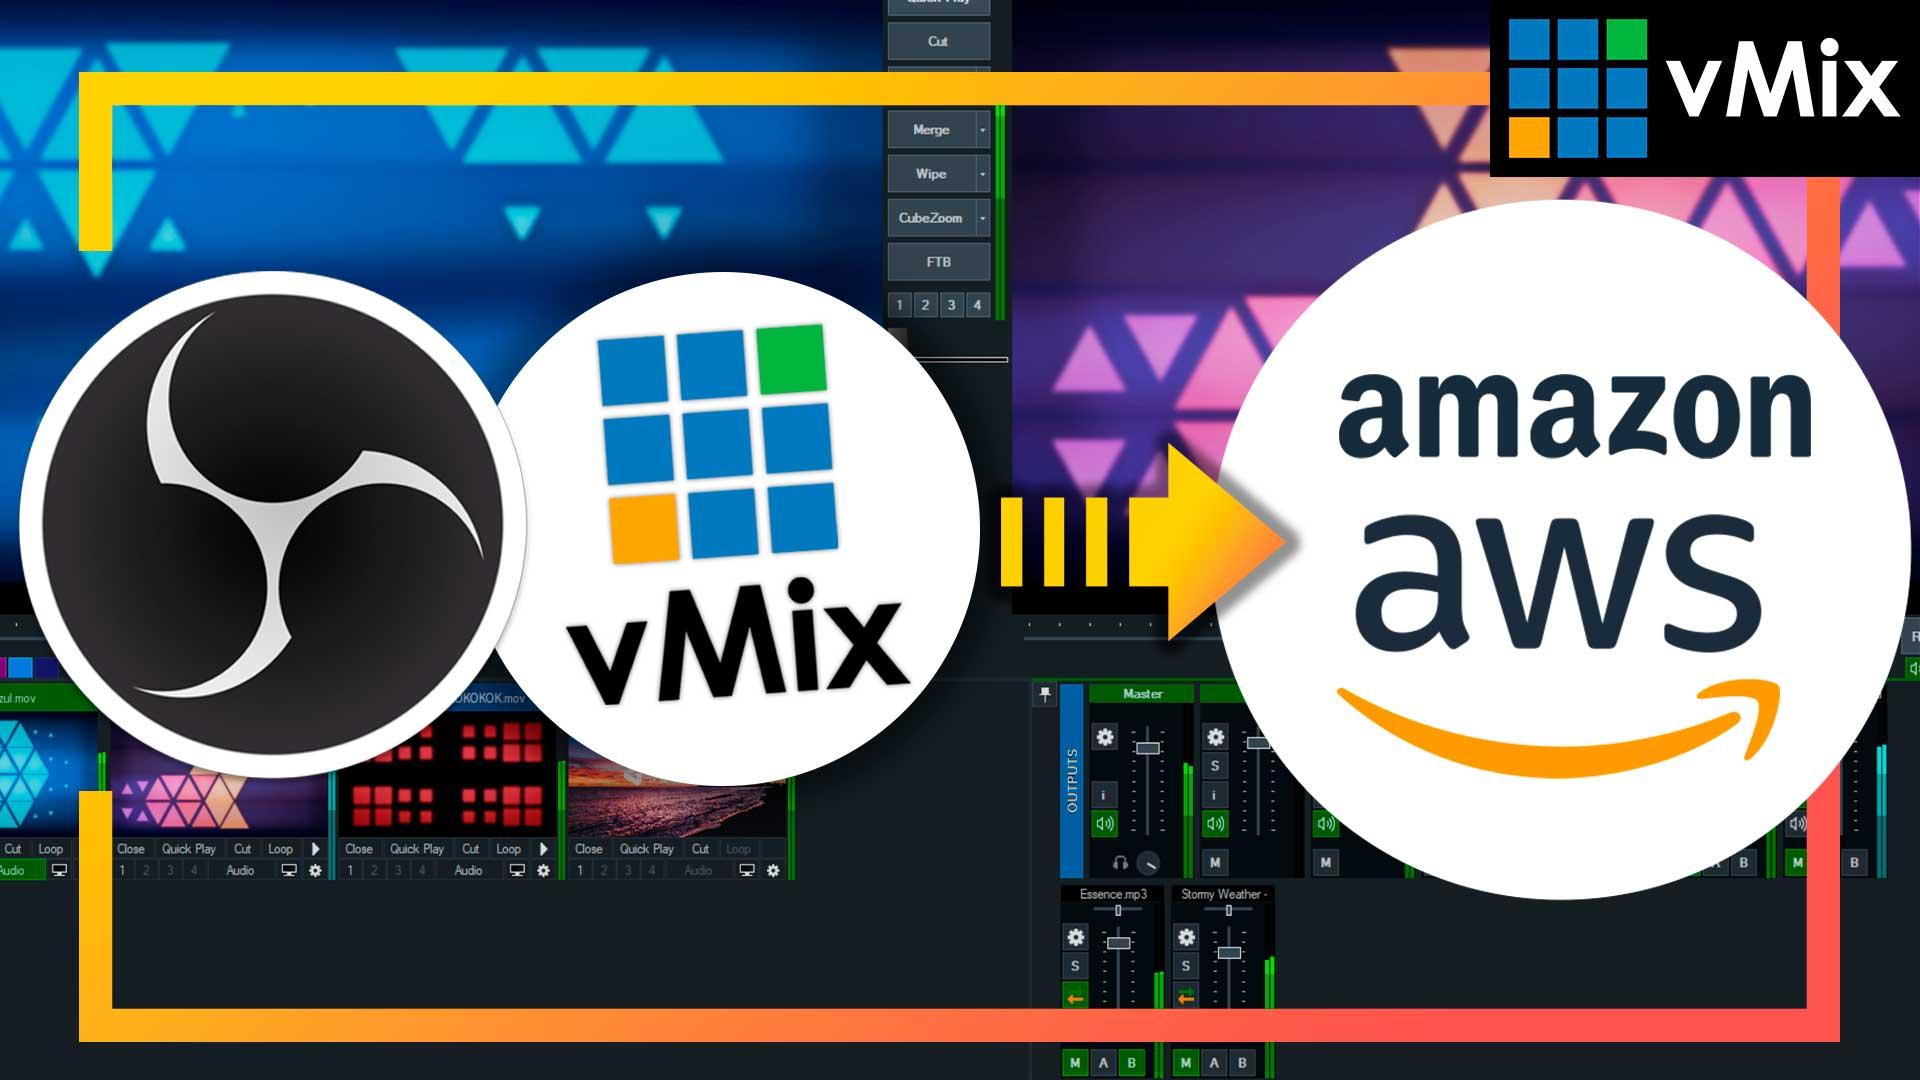 CÓMO hacer LIVE Streaming OBS & VMIX en AWS IVS + EMBED html ▶ Capa gratuita de Amazon IVS Interactive Video Service [Tutorial Español vMix]